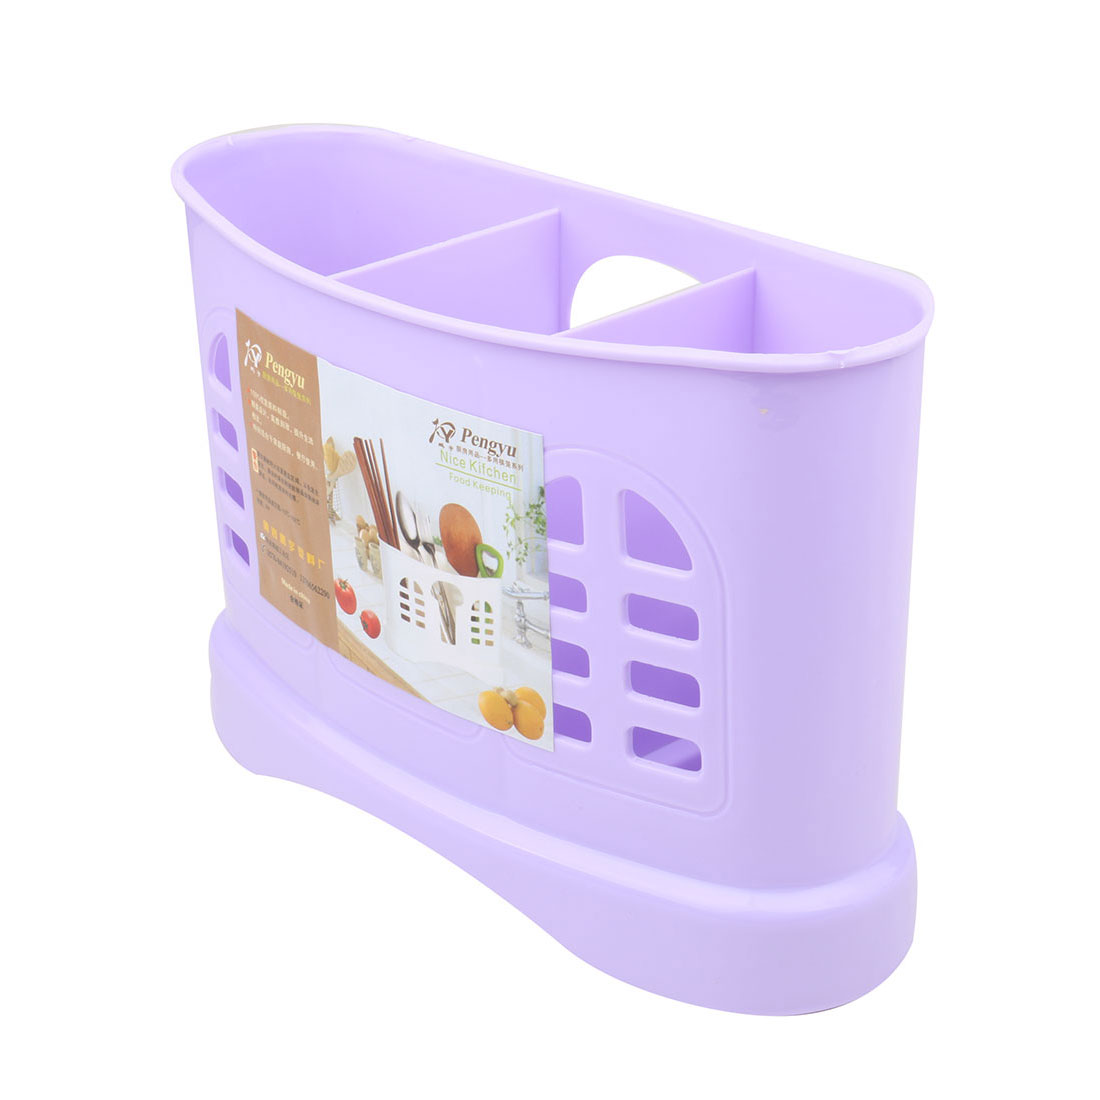 Home Plastic Hollow Out 3 Compartments Chopsticks Organizer Storage Holder Case Light Purple